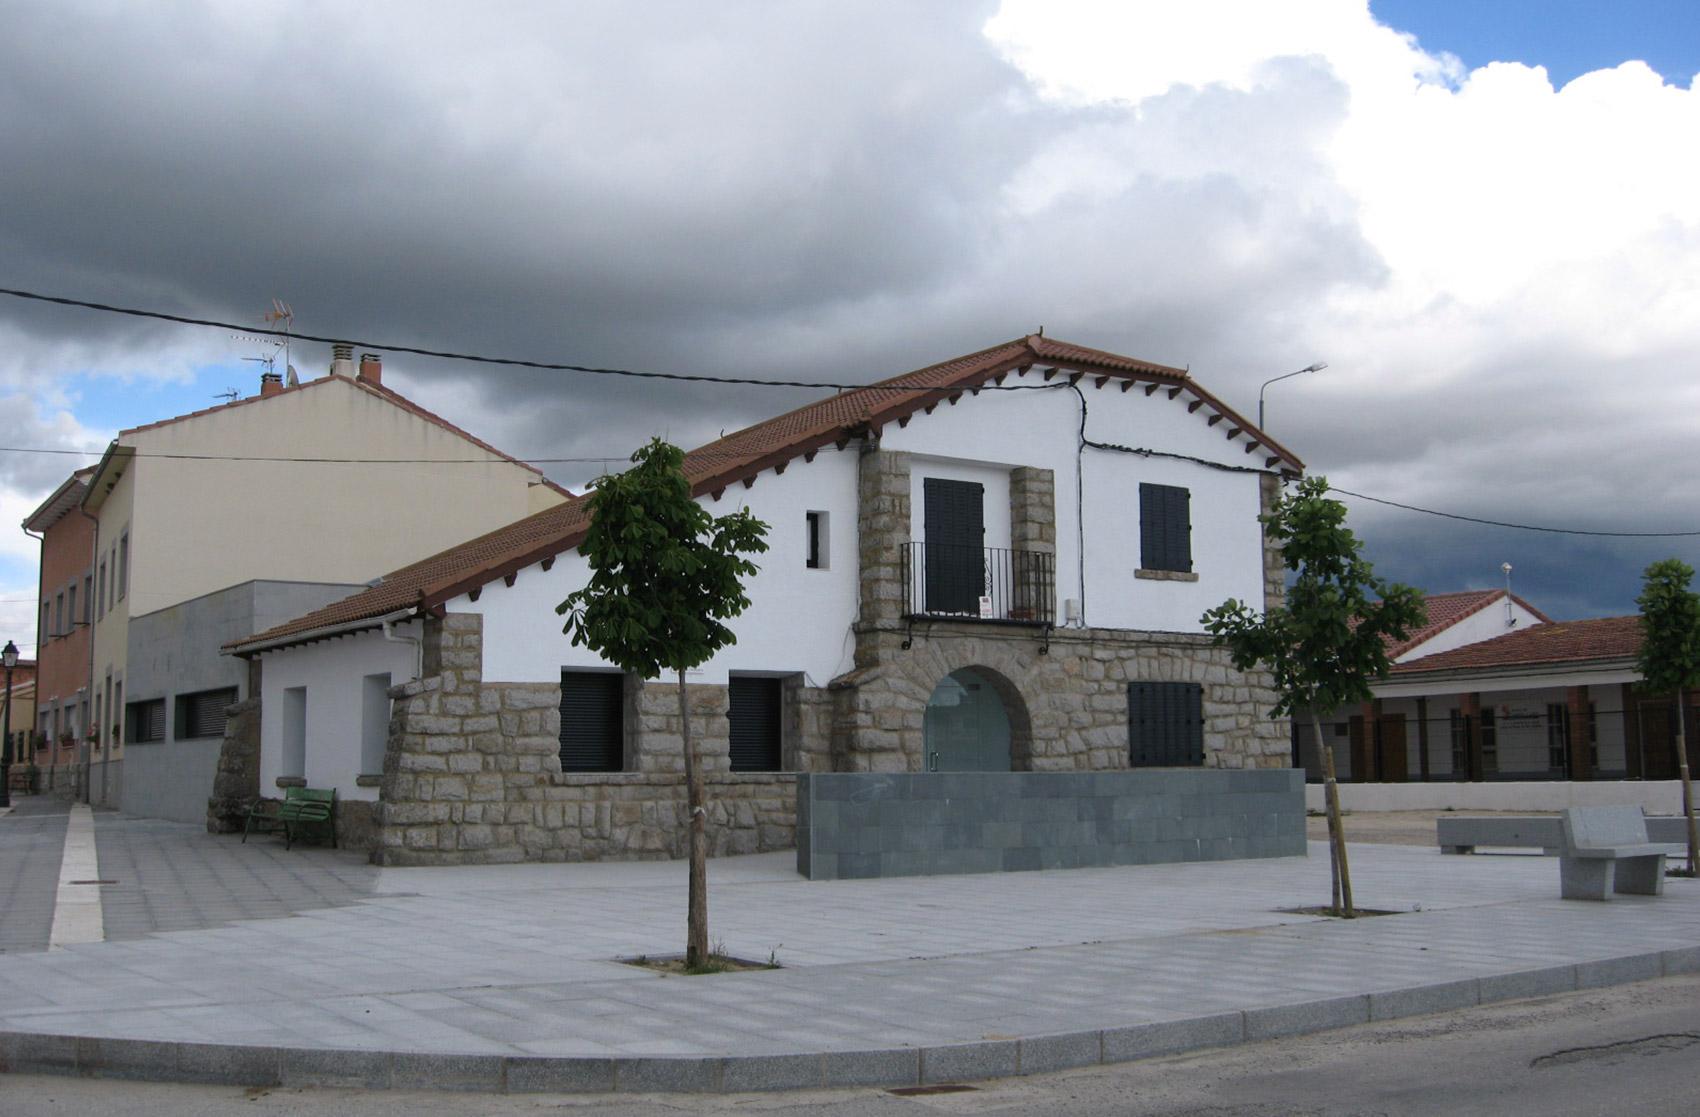 exterior Centro Atencion Primaria Navas San Antonio